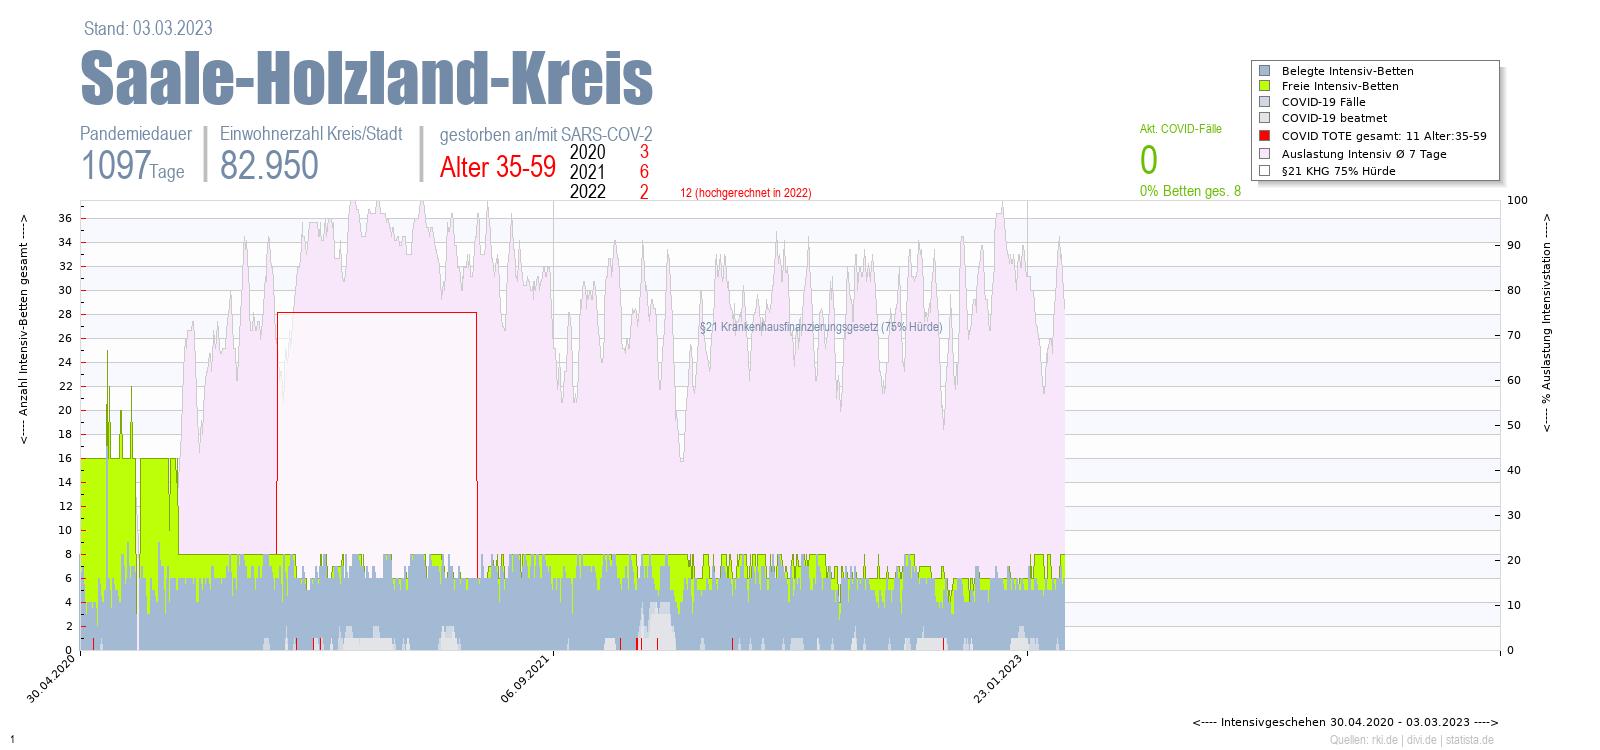 Intensivstation Auslastung Saale-Holzland-Kreis Alter 0-4